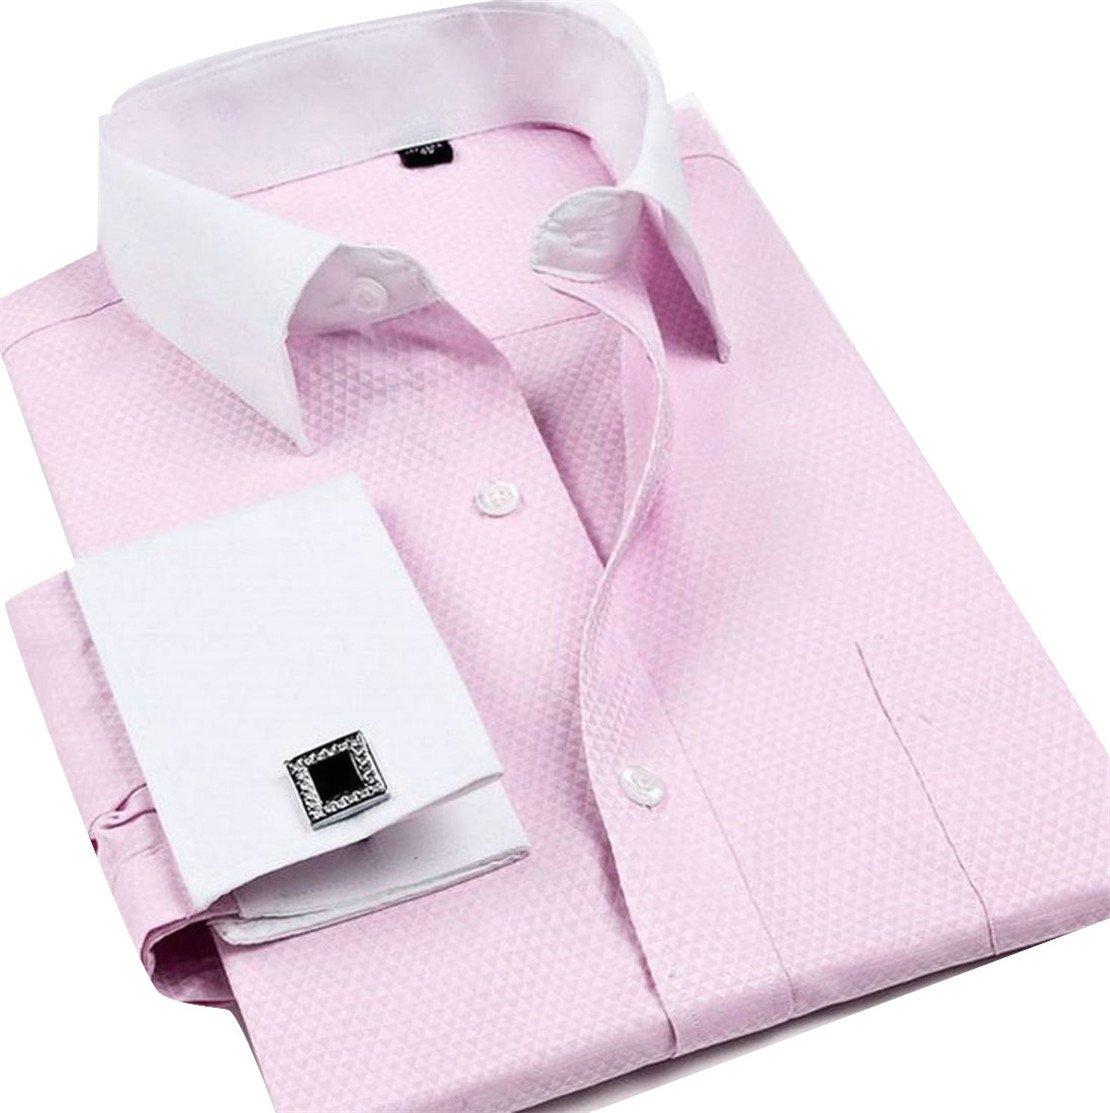 Wofupowga Men Lapel Neck Cufflinks Casual Pocket Long Sleeve Button Down Shirts Pink XXL